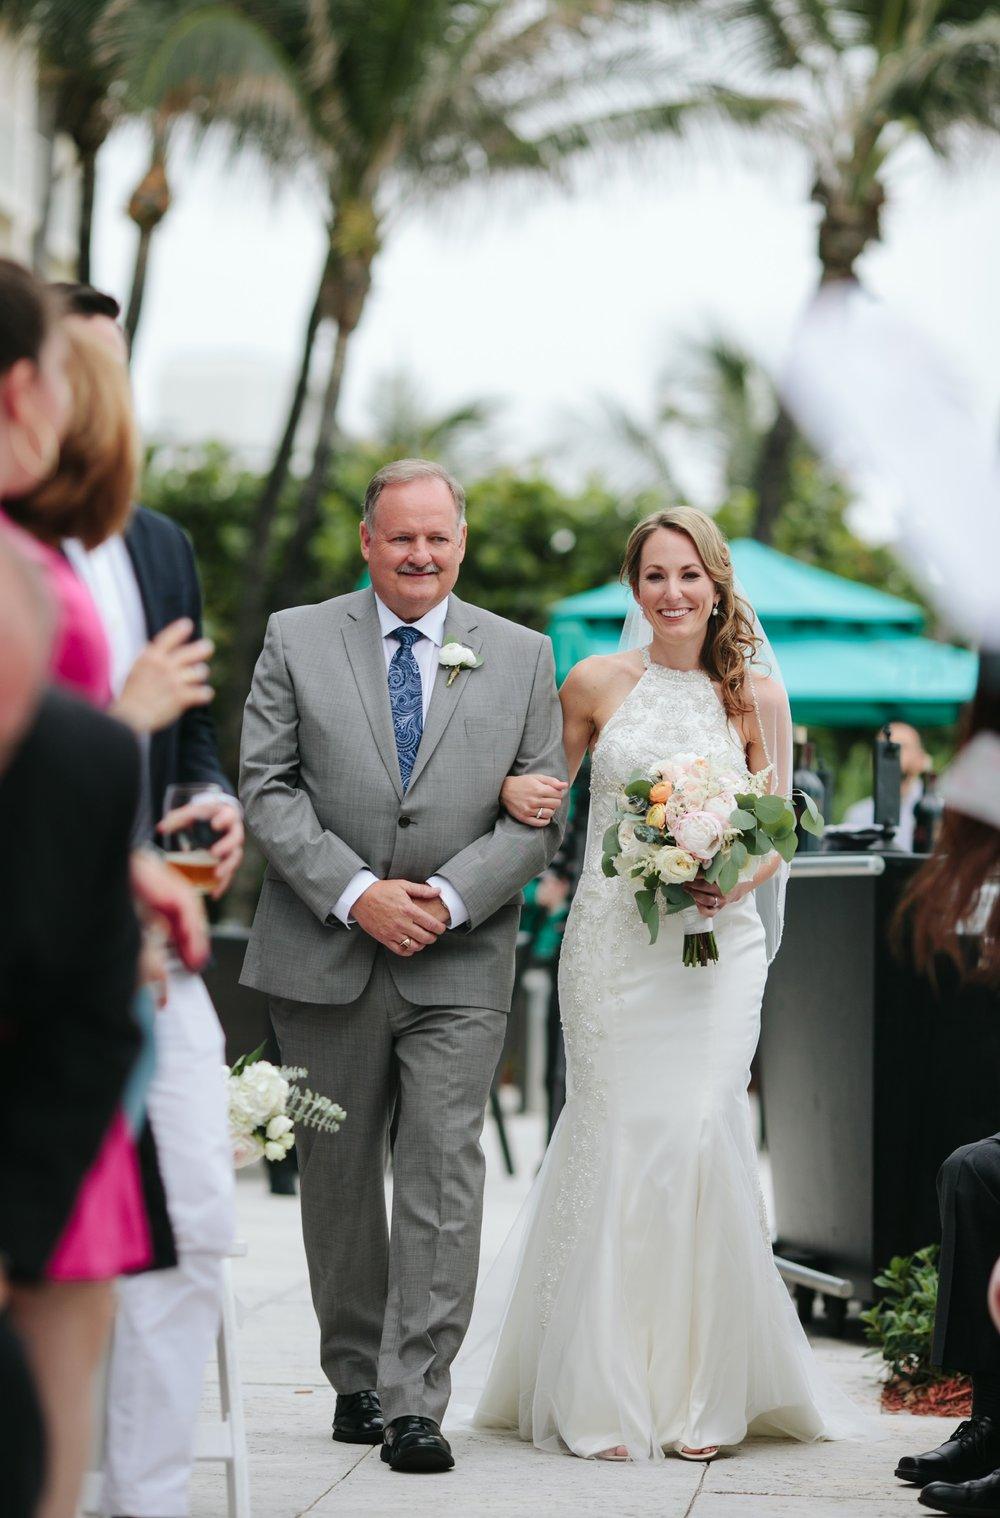 Wedding at the Tideline Resort in Palm Beach31.jpg